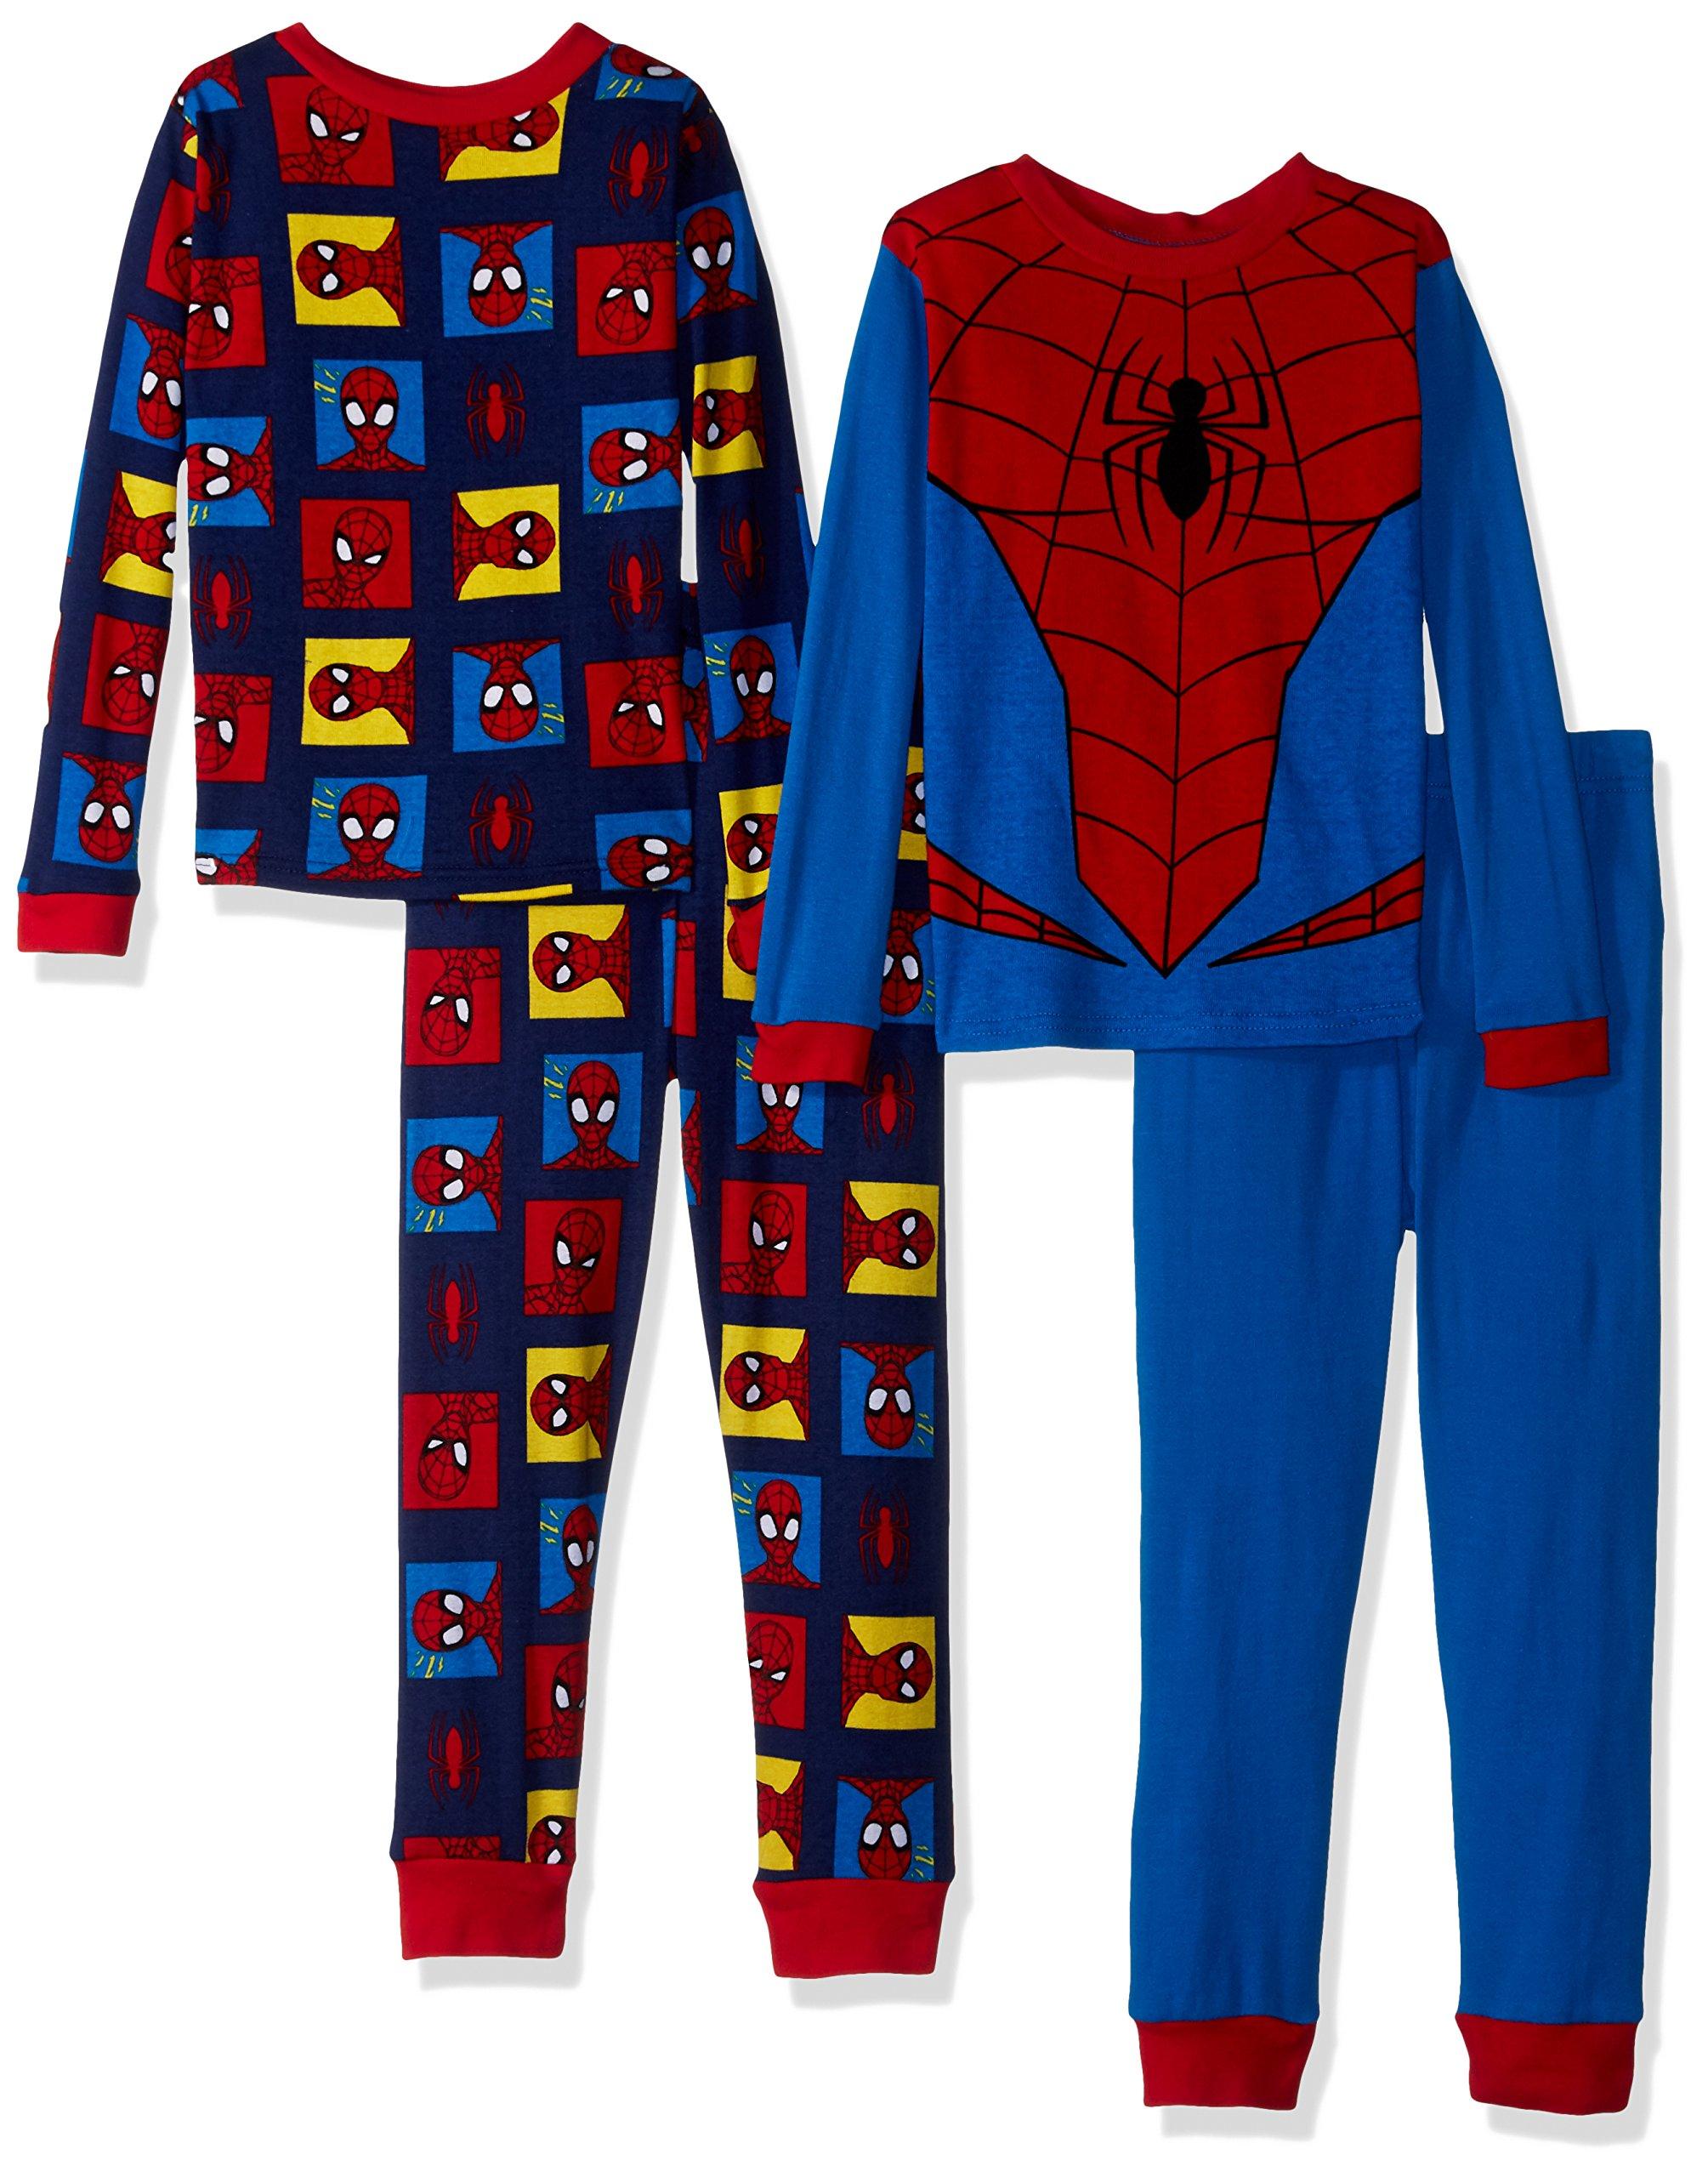 Marvel  Boys' Big Spiderman 4-Piece Cotton Pajama Set, Spidey Suit Blue, 8